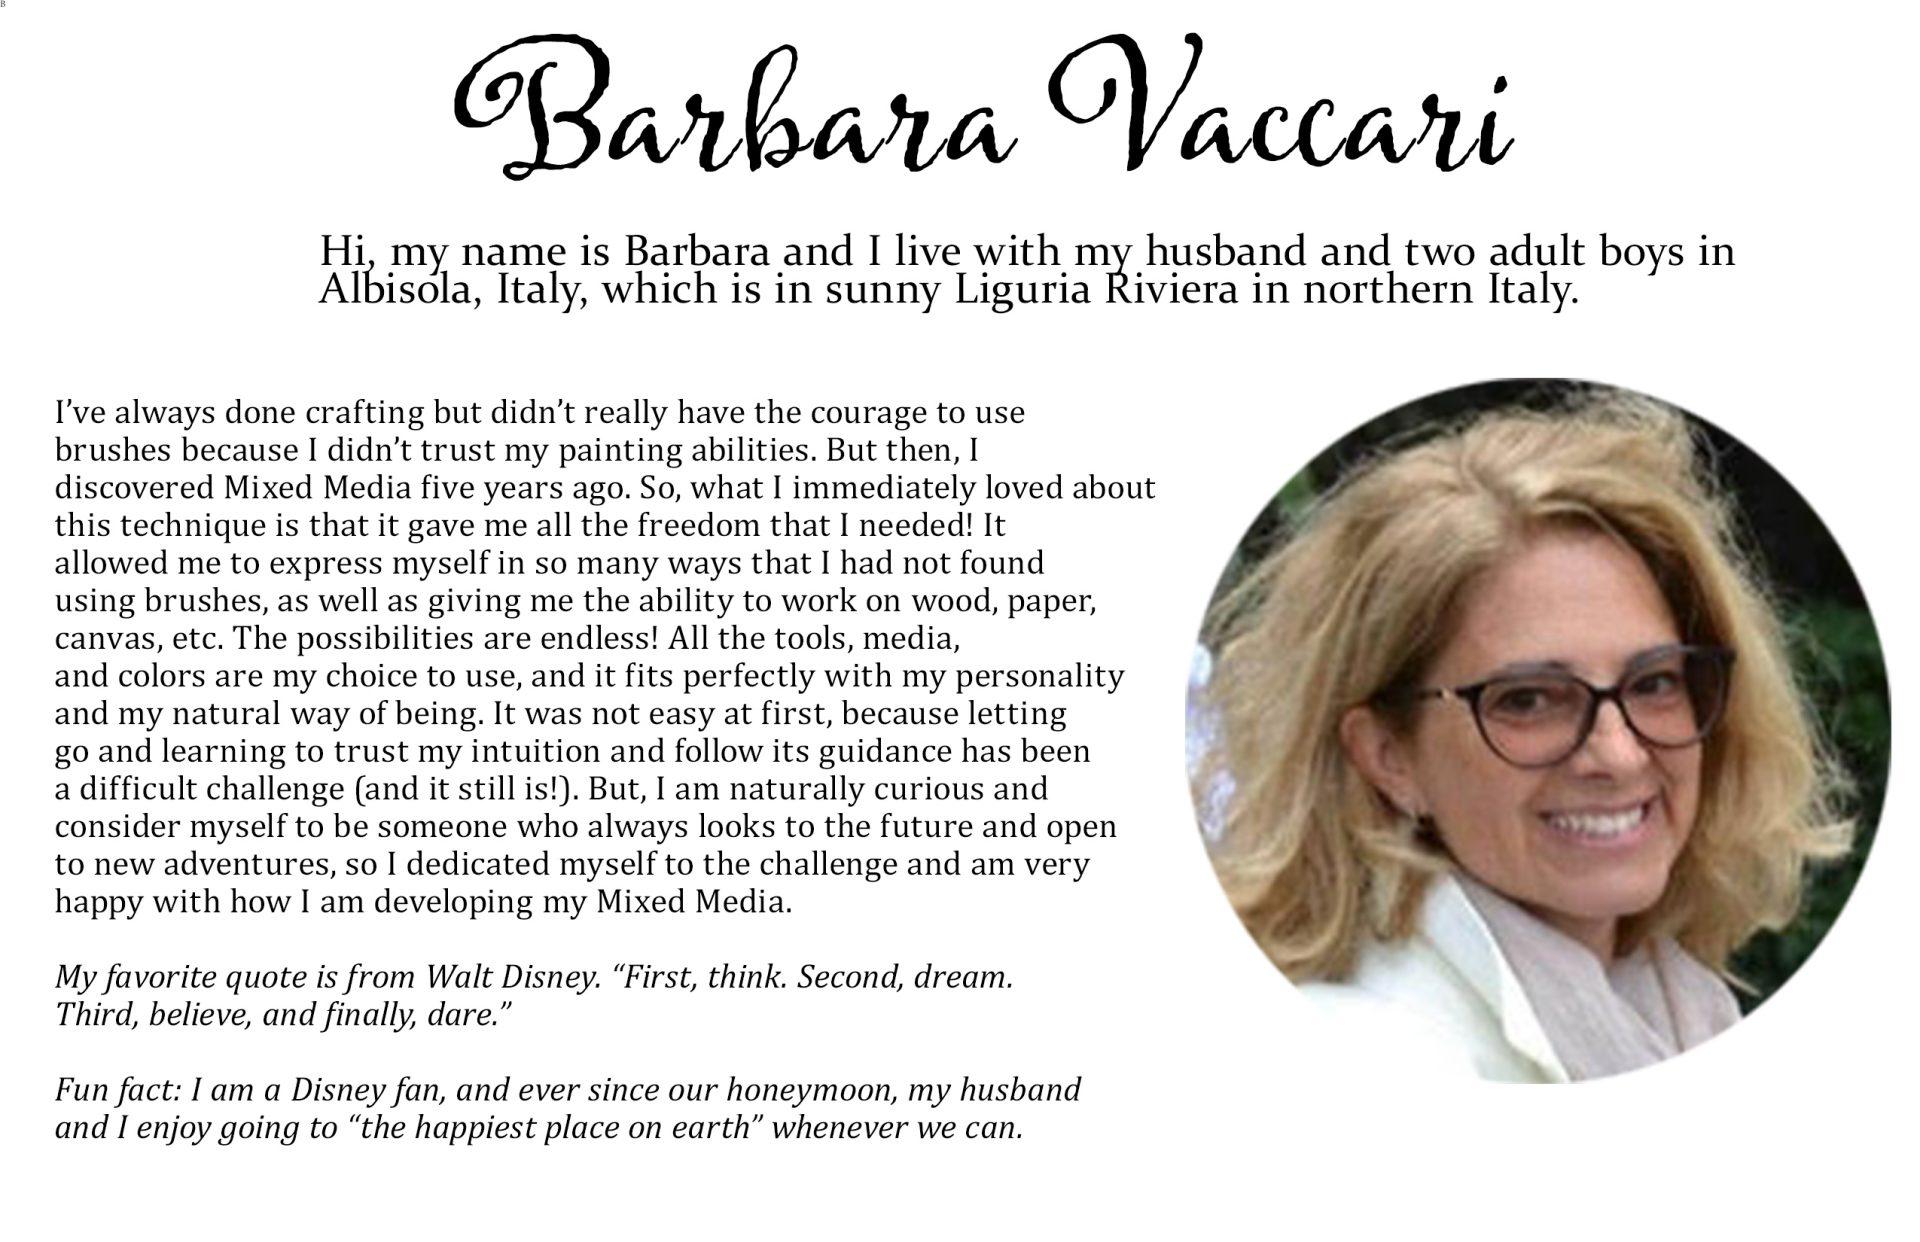 Barbara's details